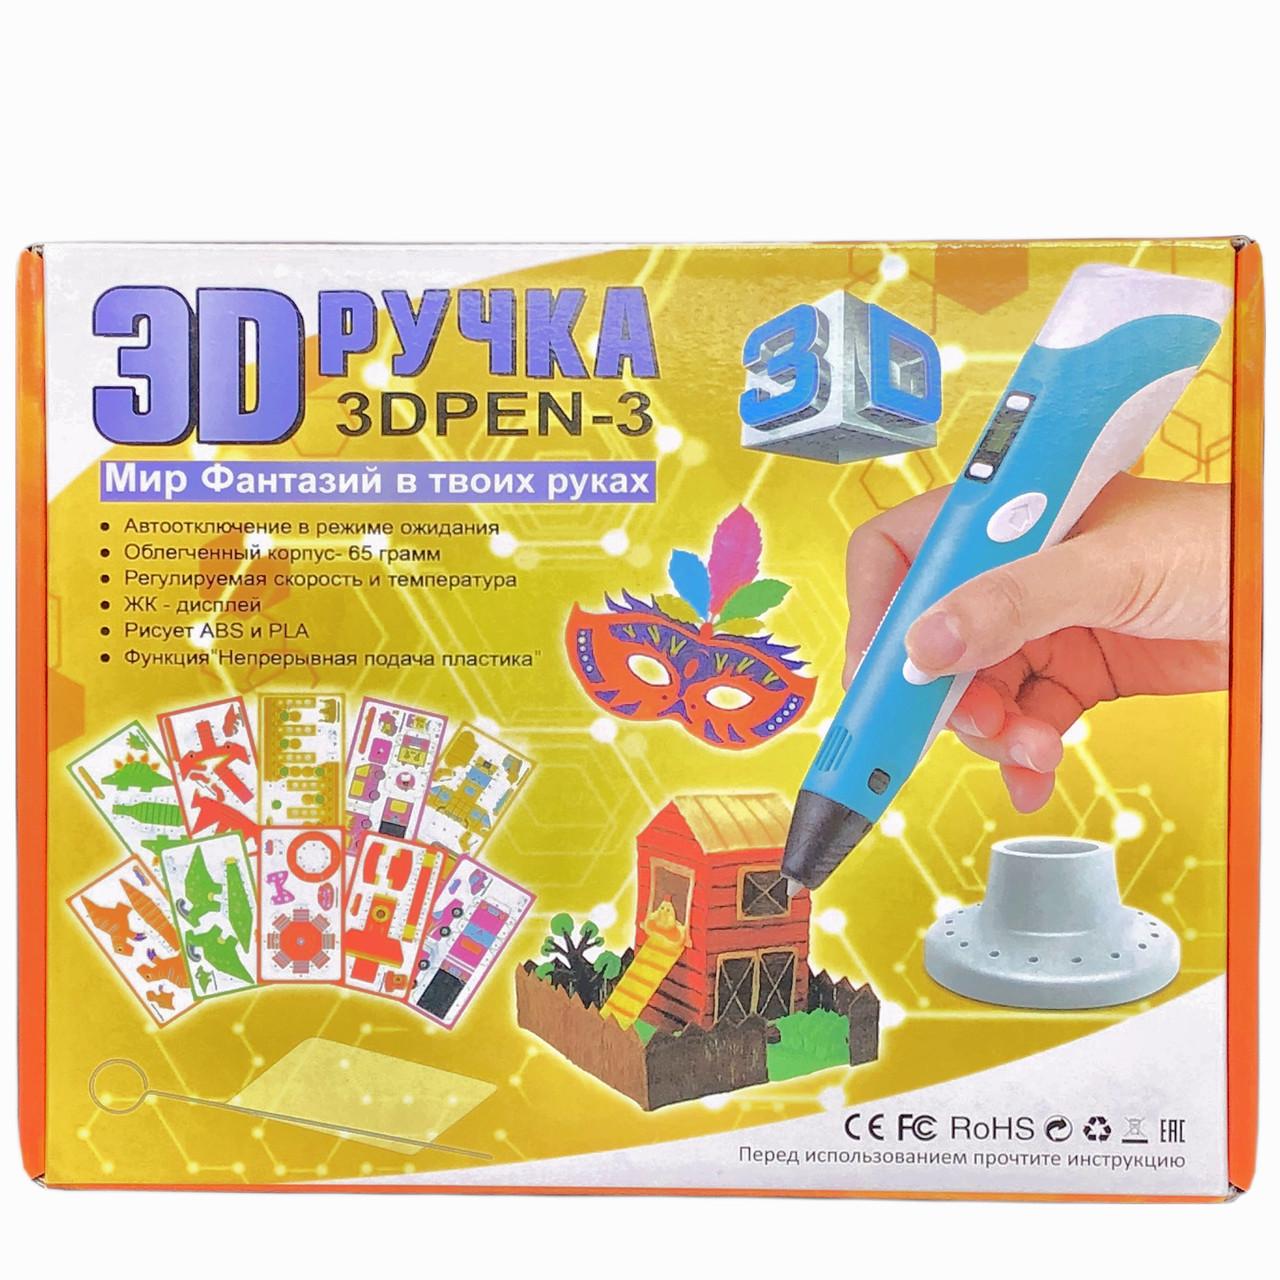 3D-ручка з трафаретами, 3D Pen-3 c LCD дисплеєм рожева